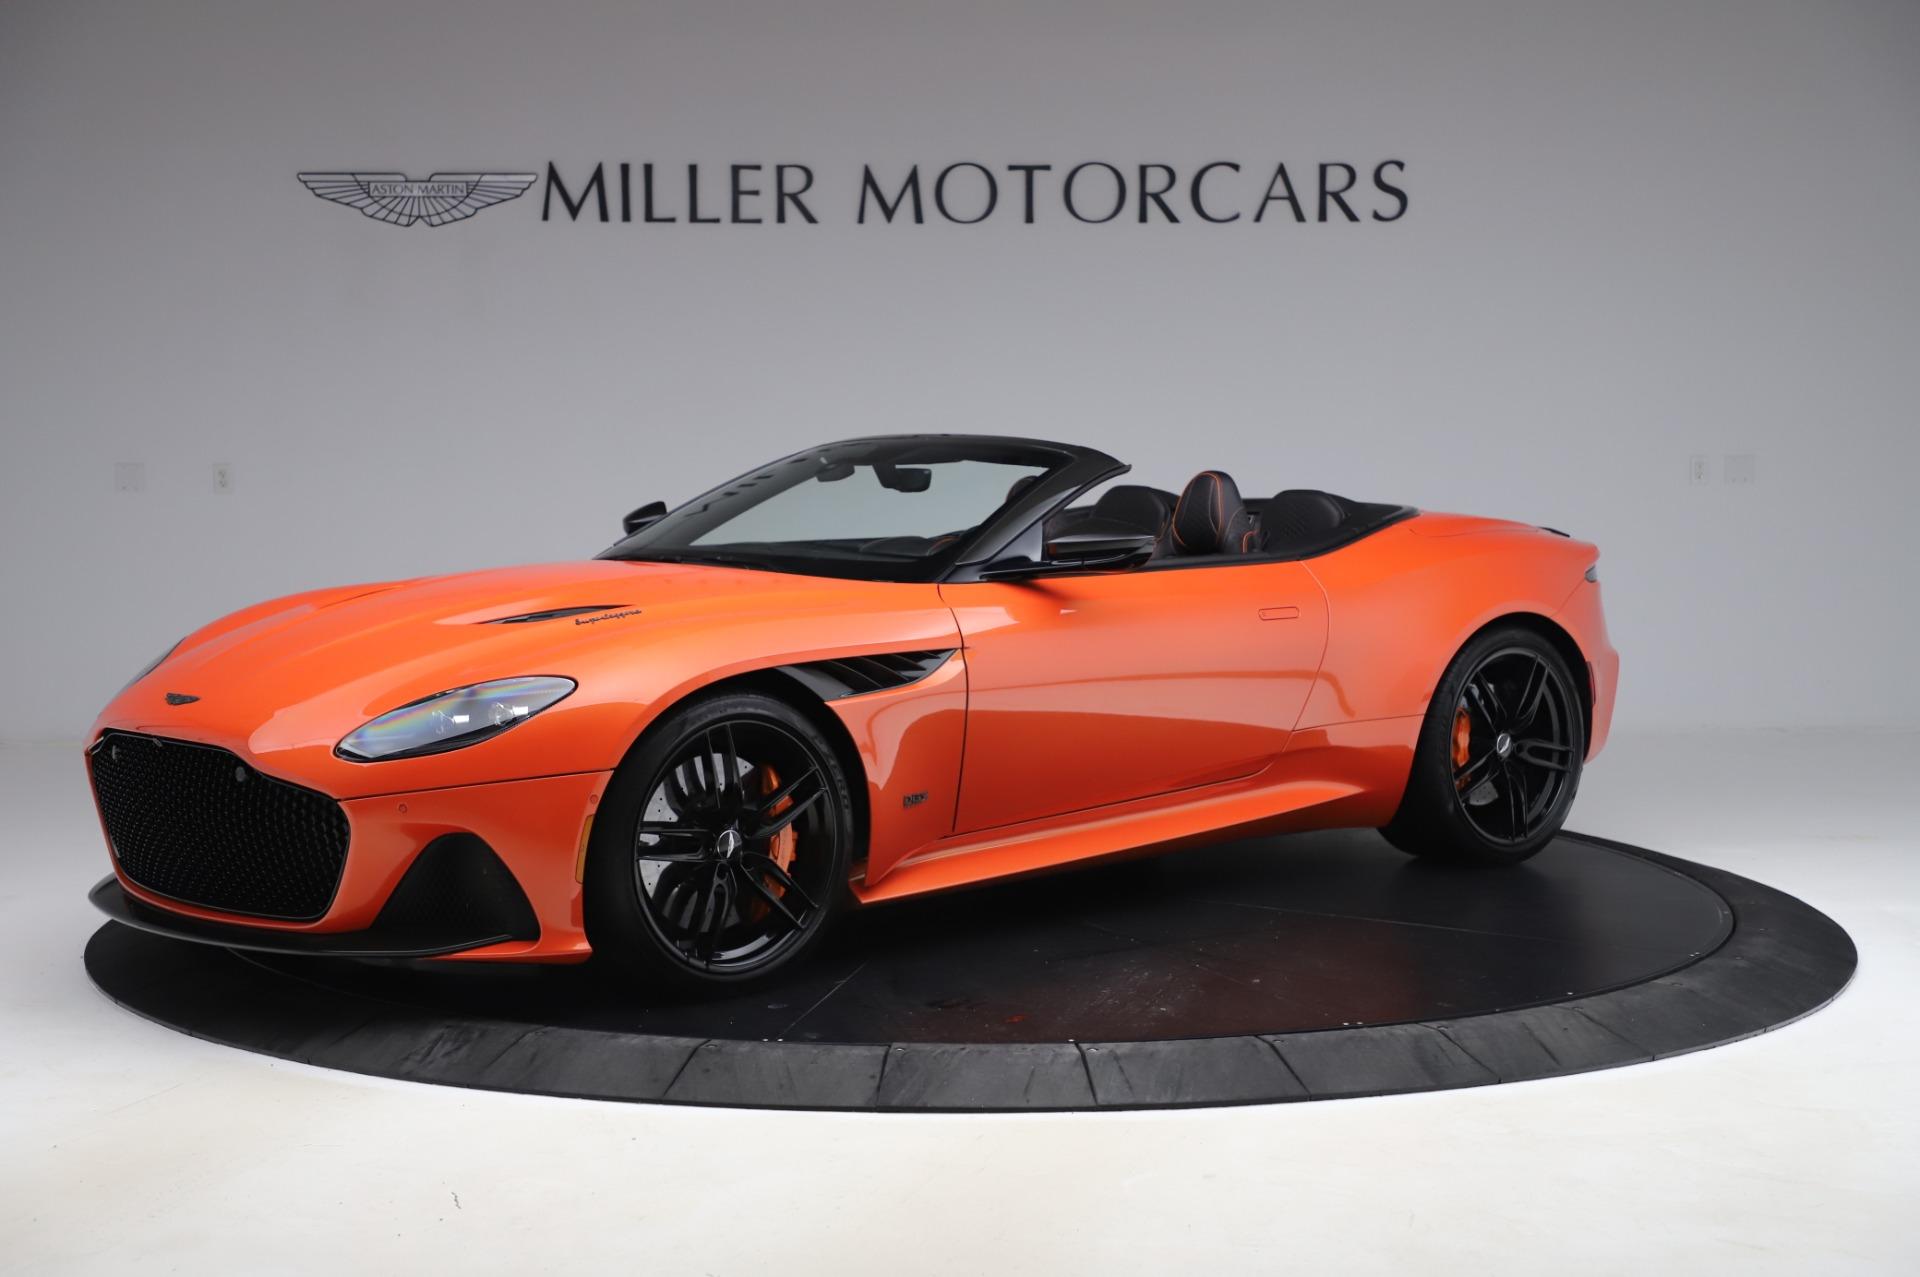 Used 2020 Aston Martin DBS Superleggera Volante for sale $339,800 at Maserati of Westport in Westport CT 06880 1